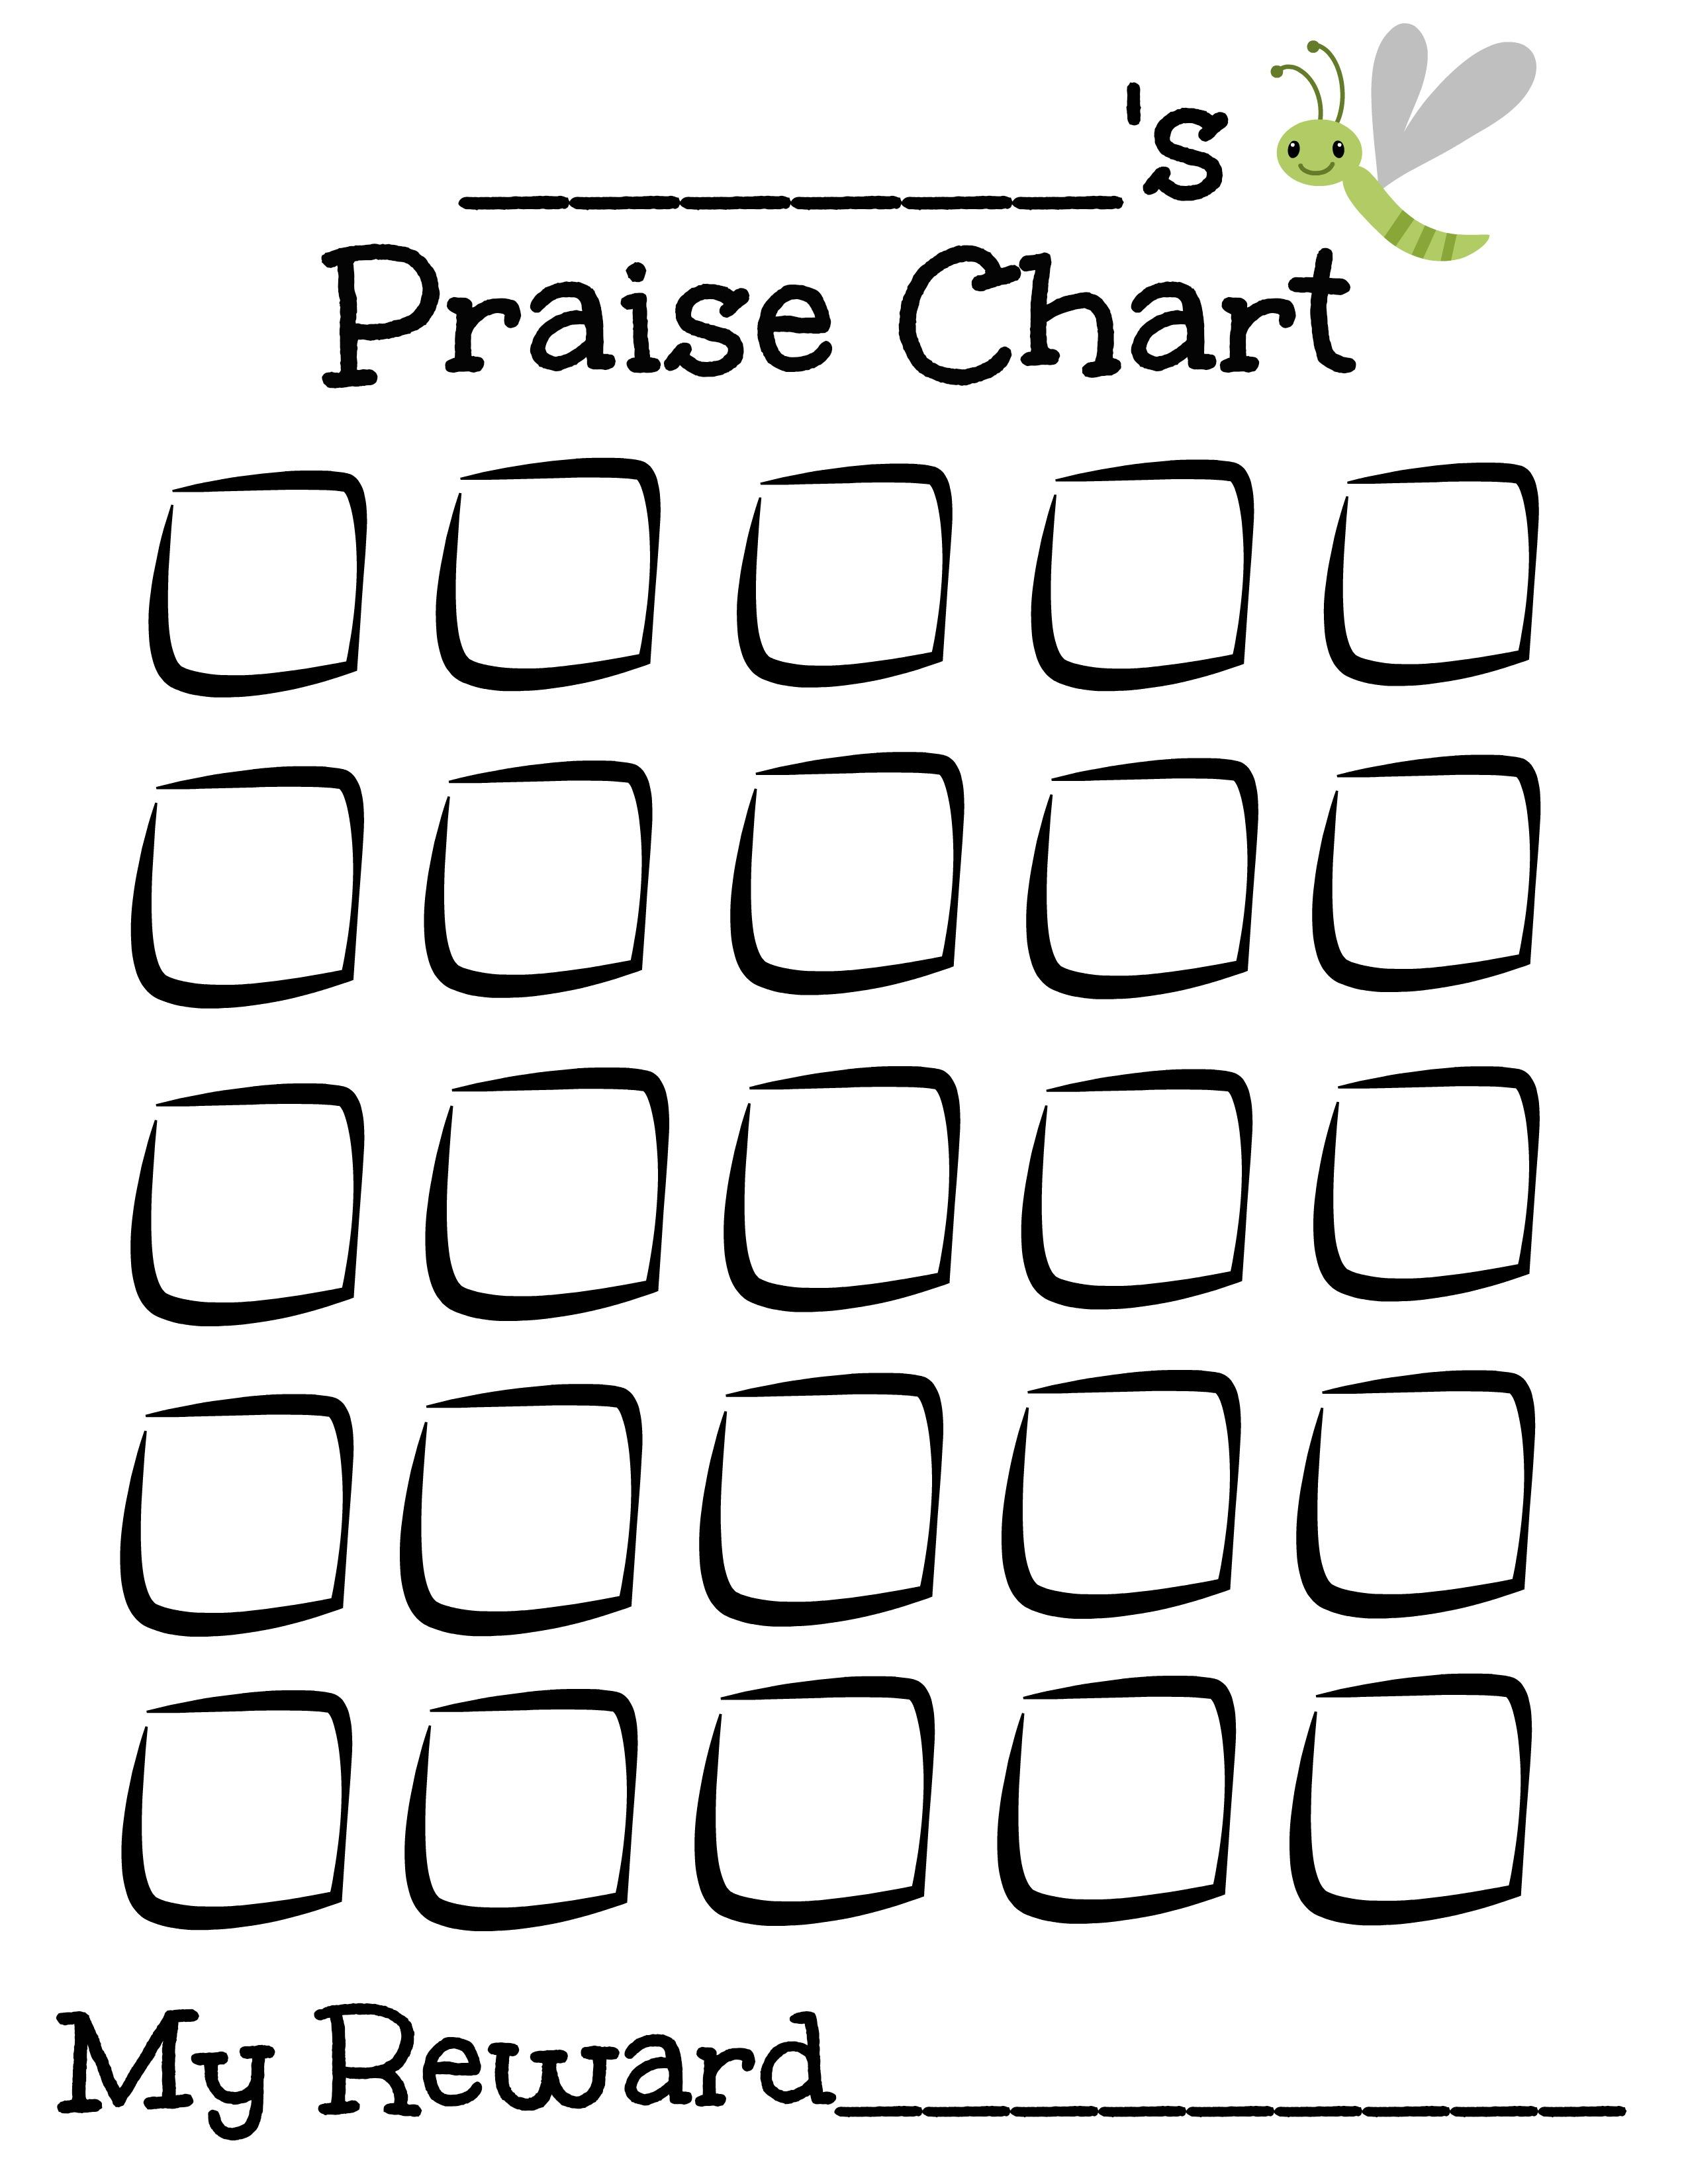 Free Printable Praise Chart